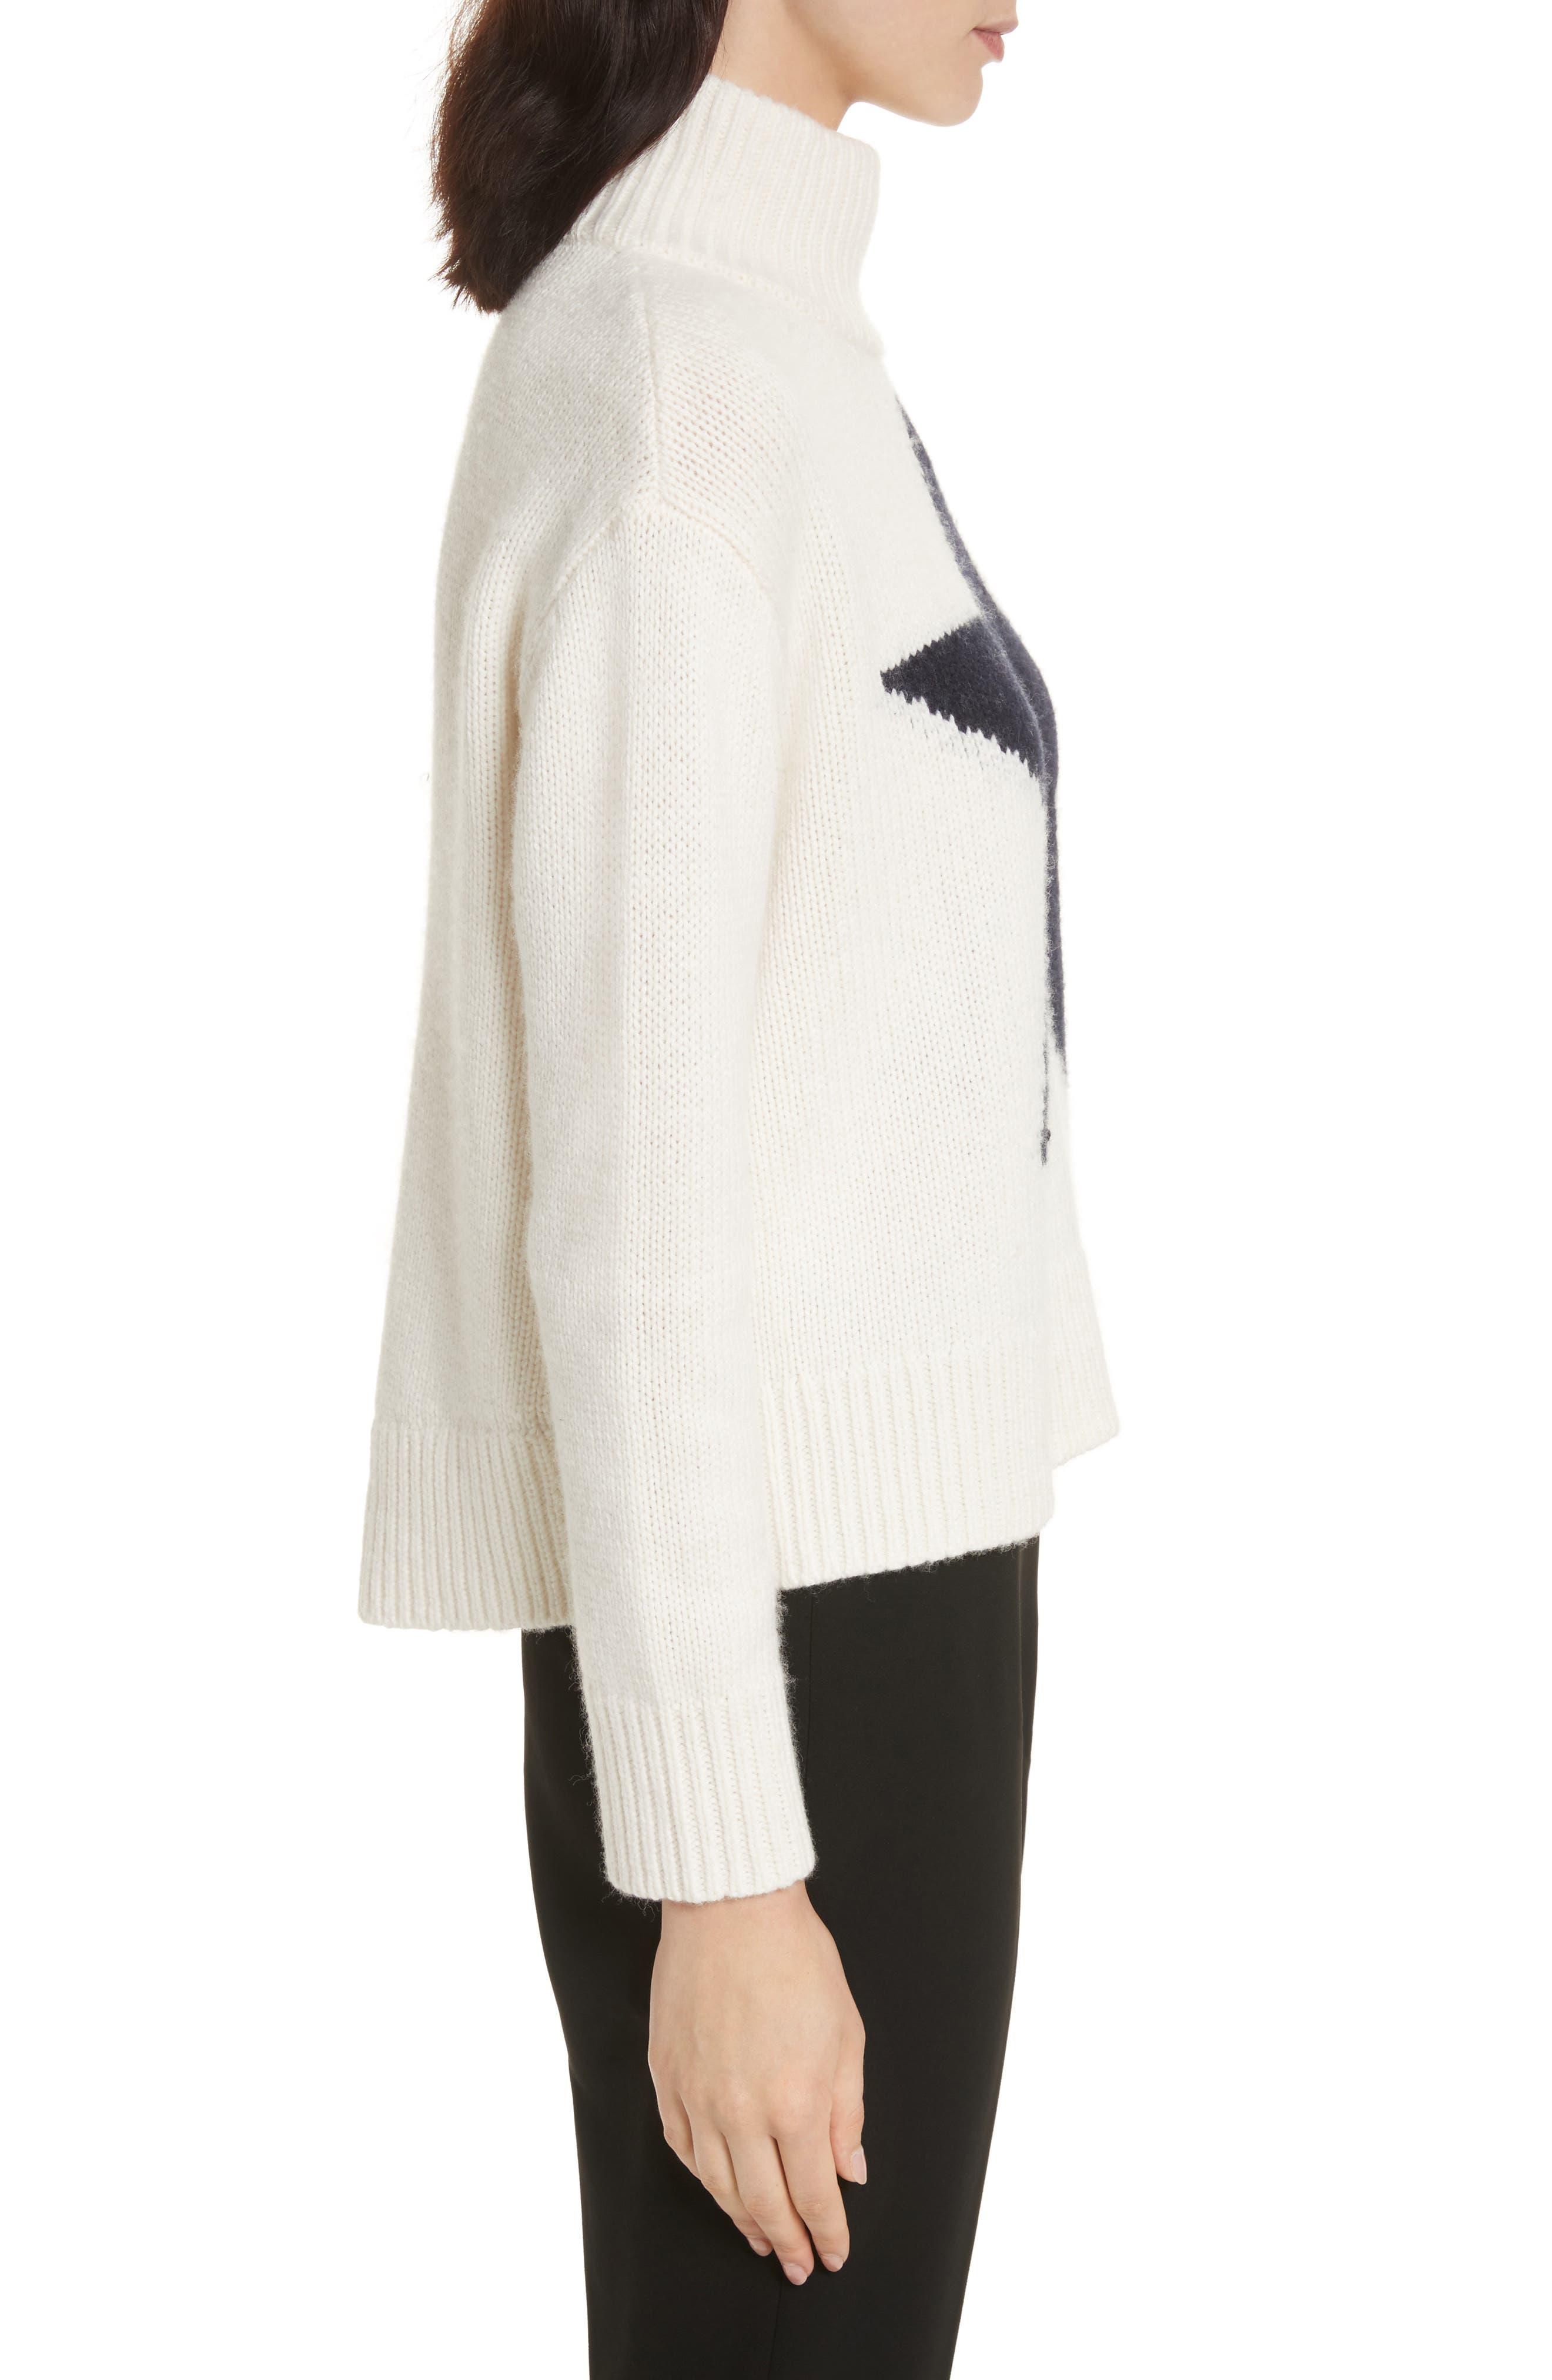 star turtleneck sweater,                             Alternate thumbnail 5, color,                             Cream/ Navy